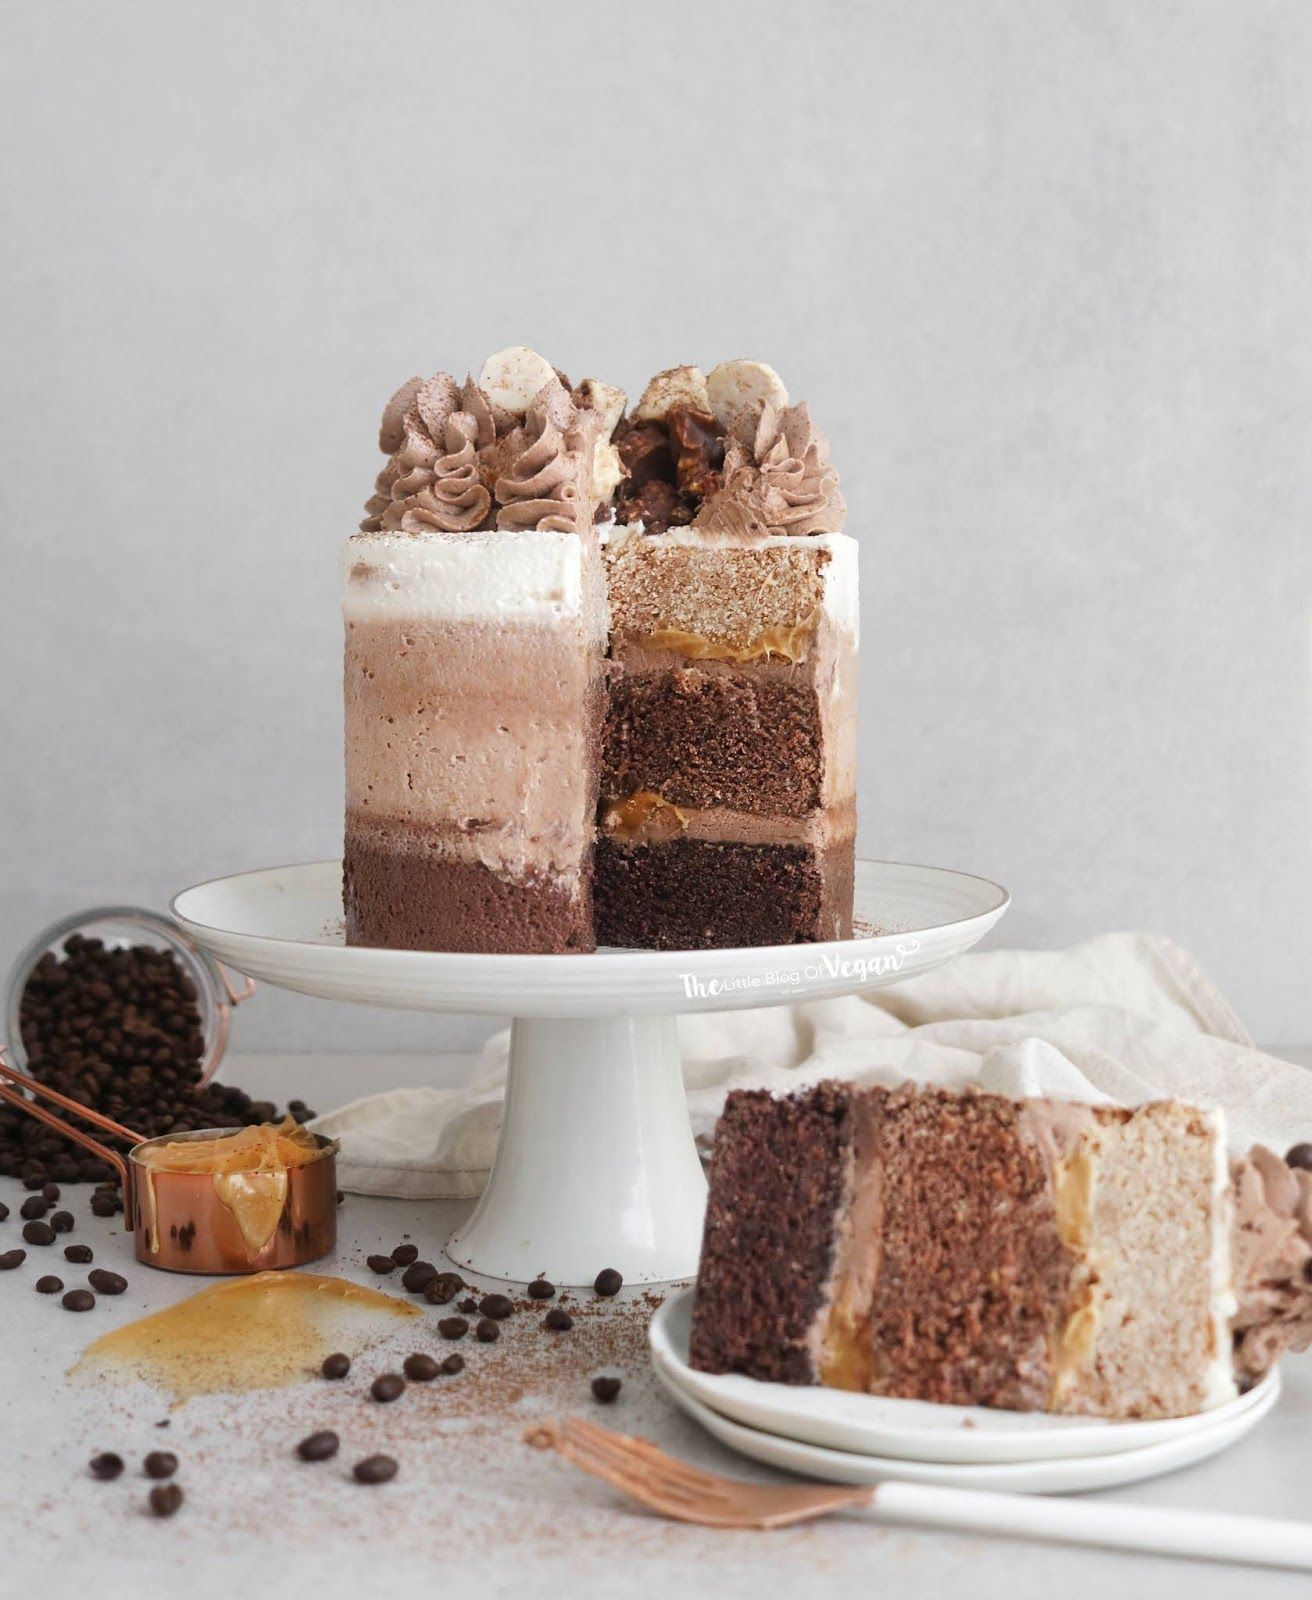 Chocolate Coffee Ombre Cake Vegan Coffee Cakes Chocolate Cake With Coffee Coffee Cake Recipes